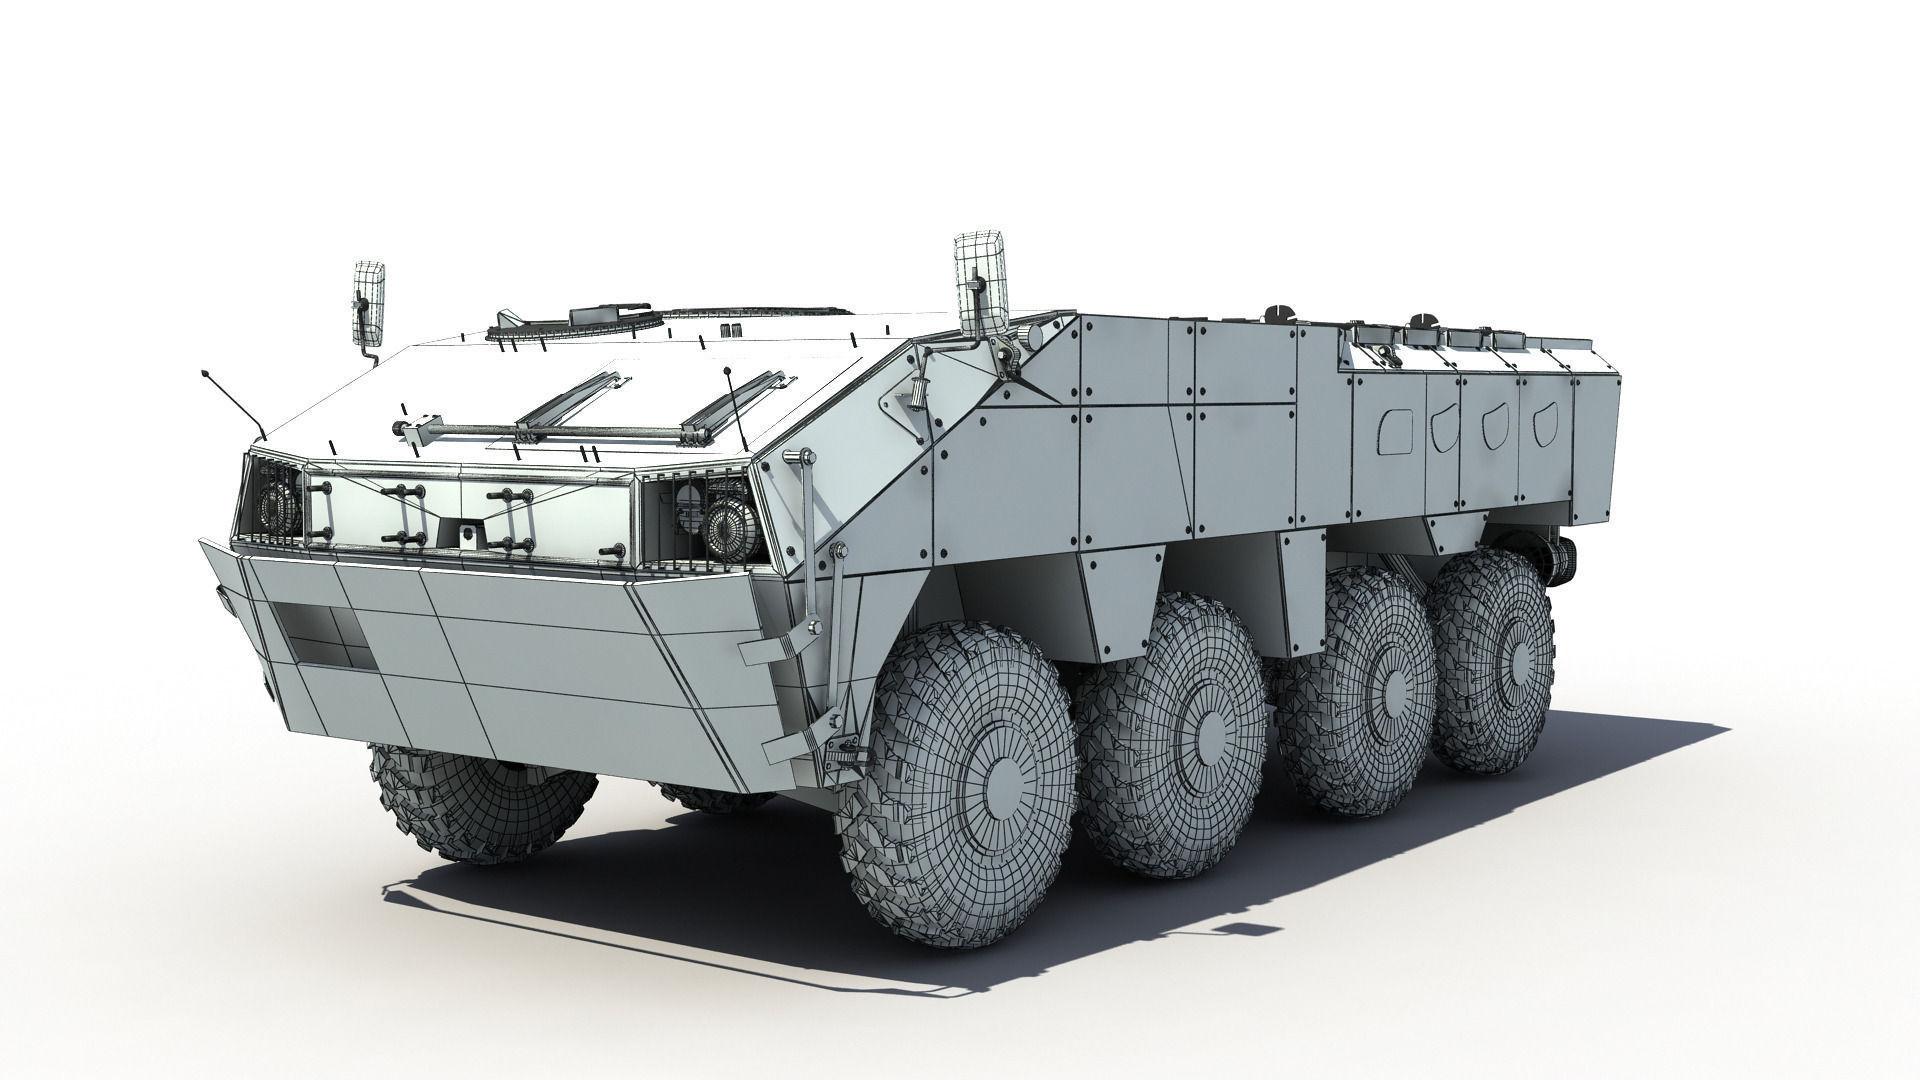 tata-kestrel-apc-3d-model-max (2).jpg